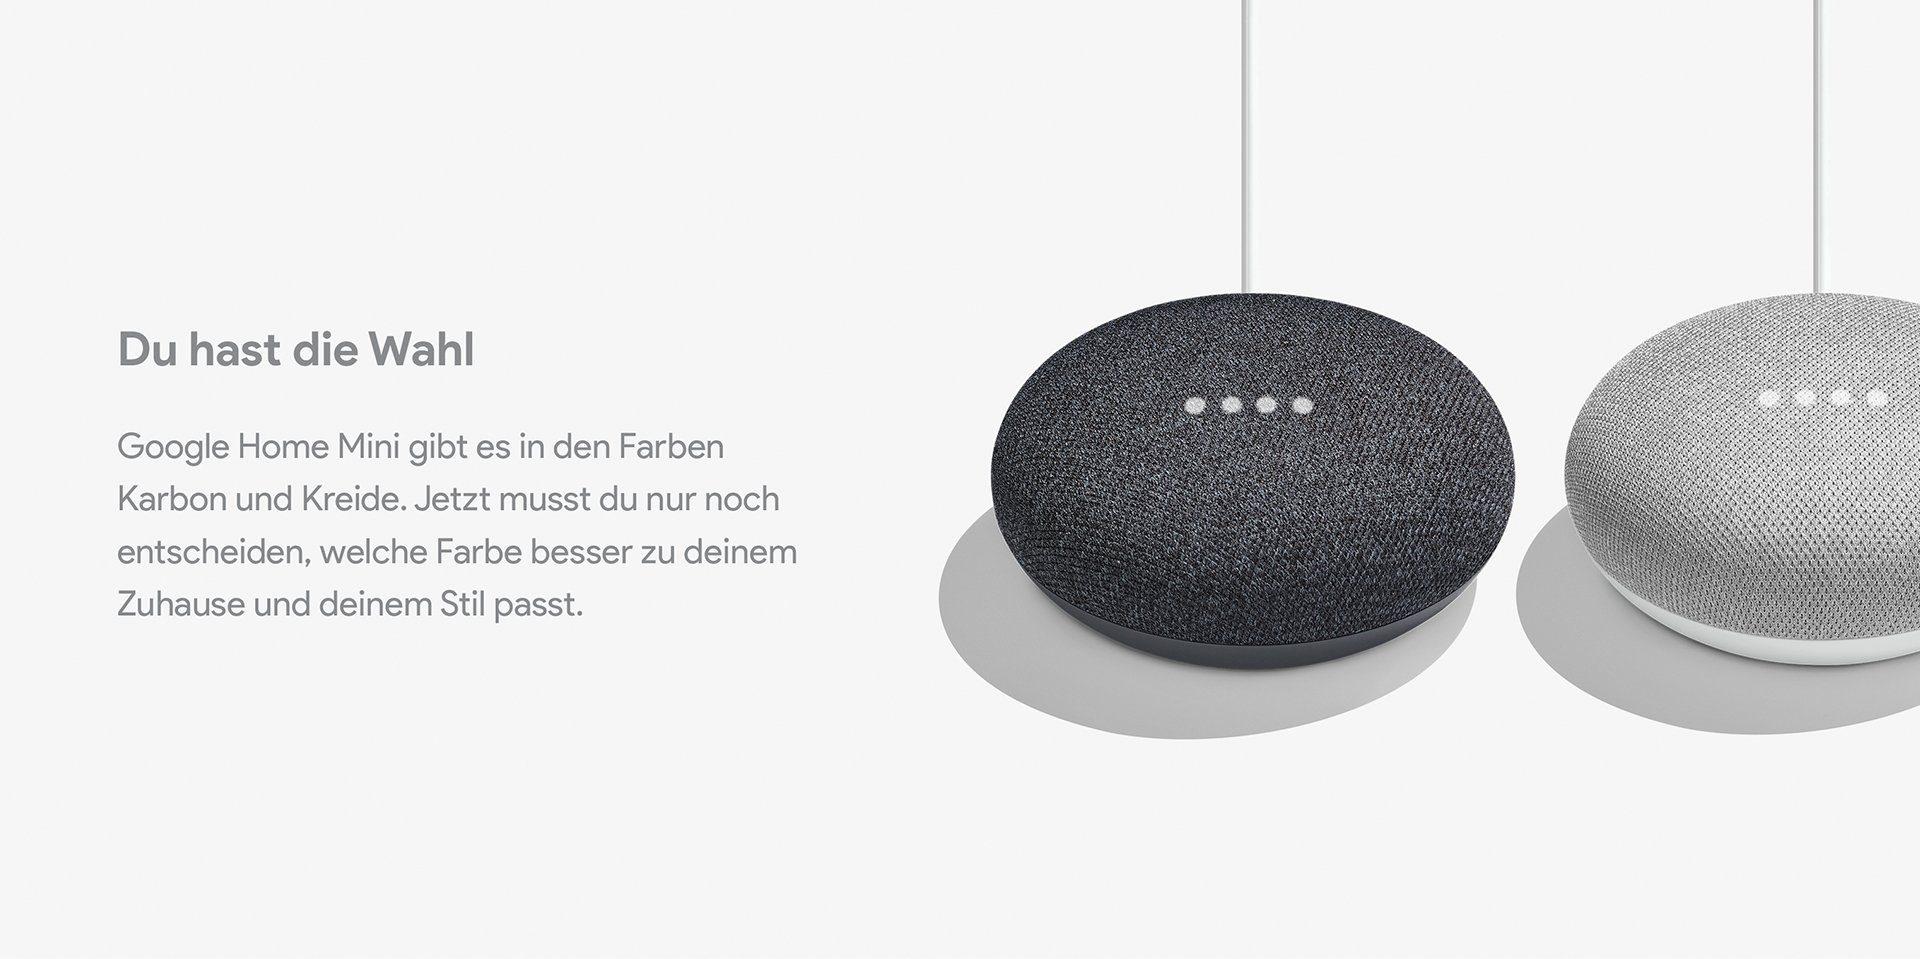 google home mini kaufen smarter lautsprecher f r wenig geld otto. Black Bedroom Furniture Sets. Home Design Ideas